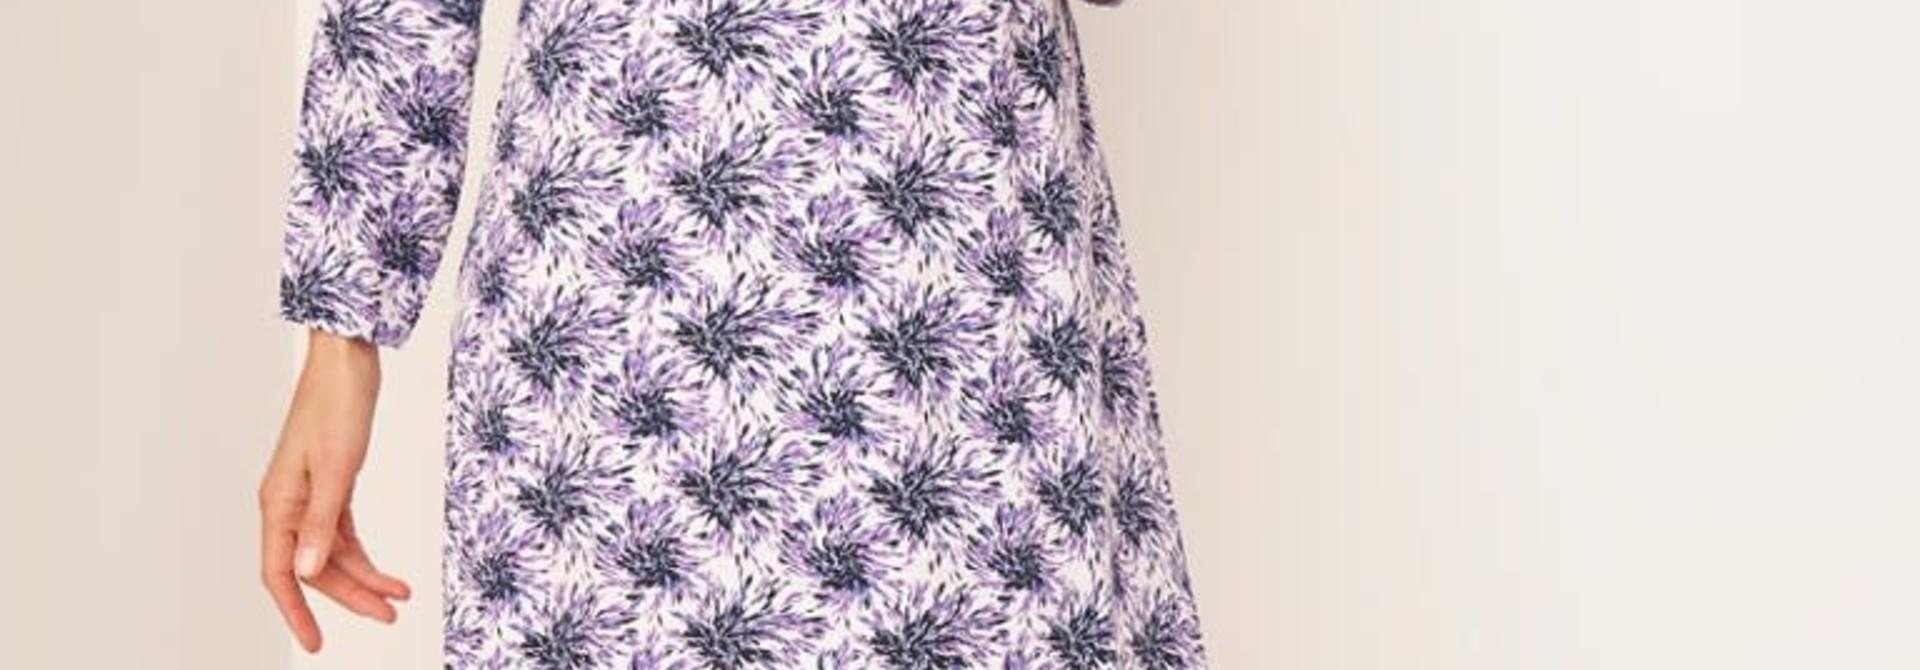 Micha dress by malene birger